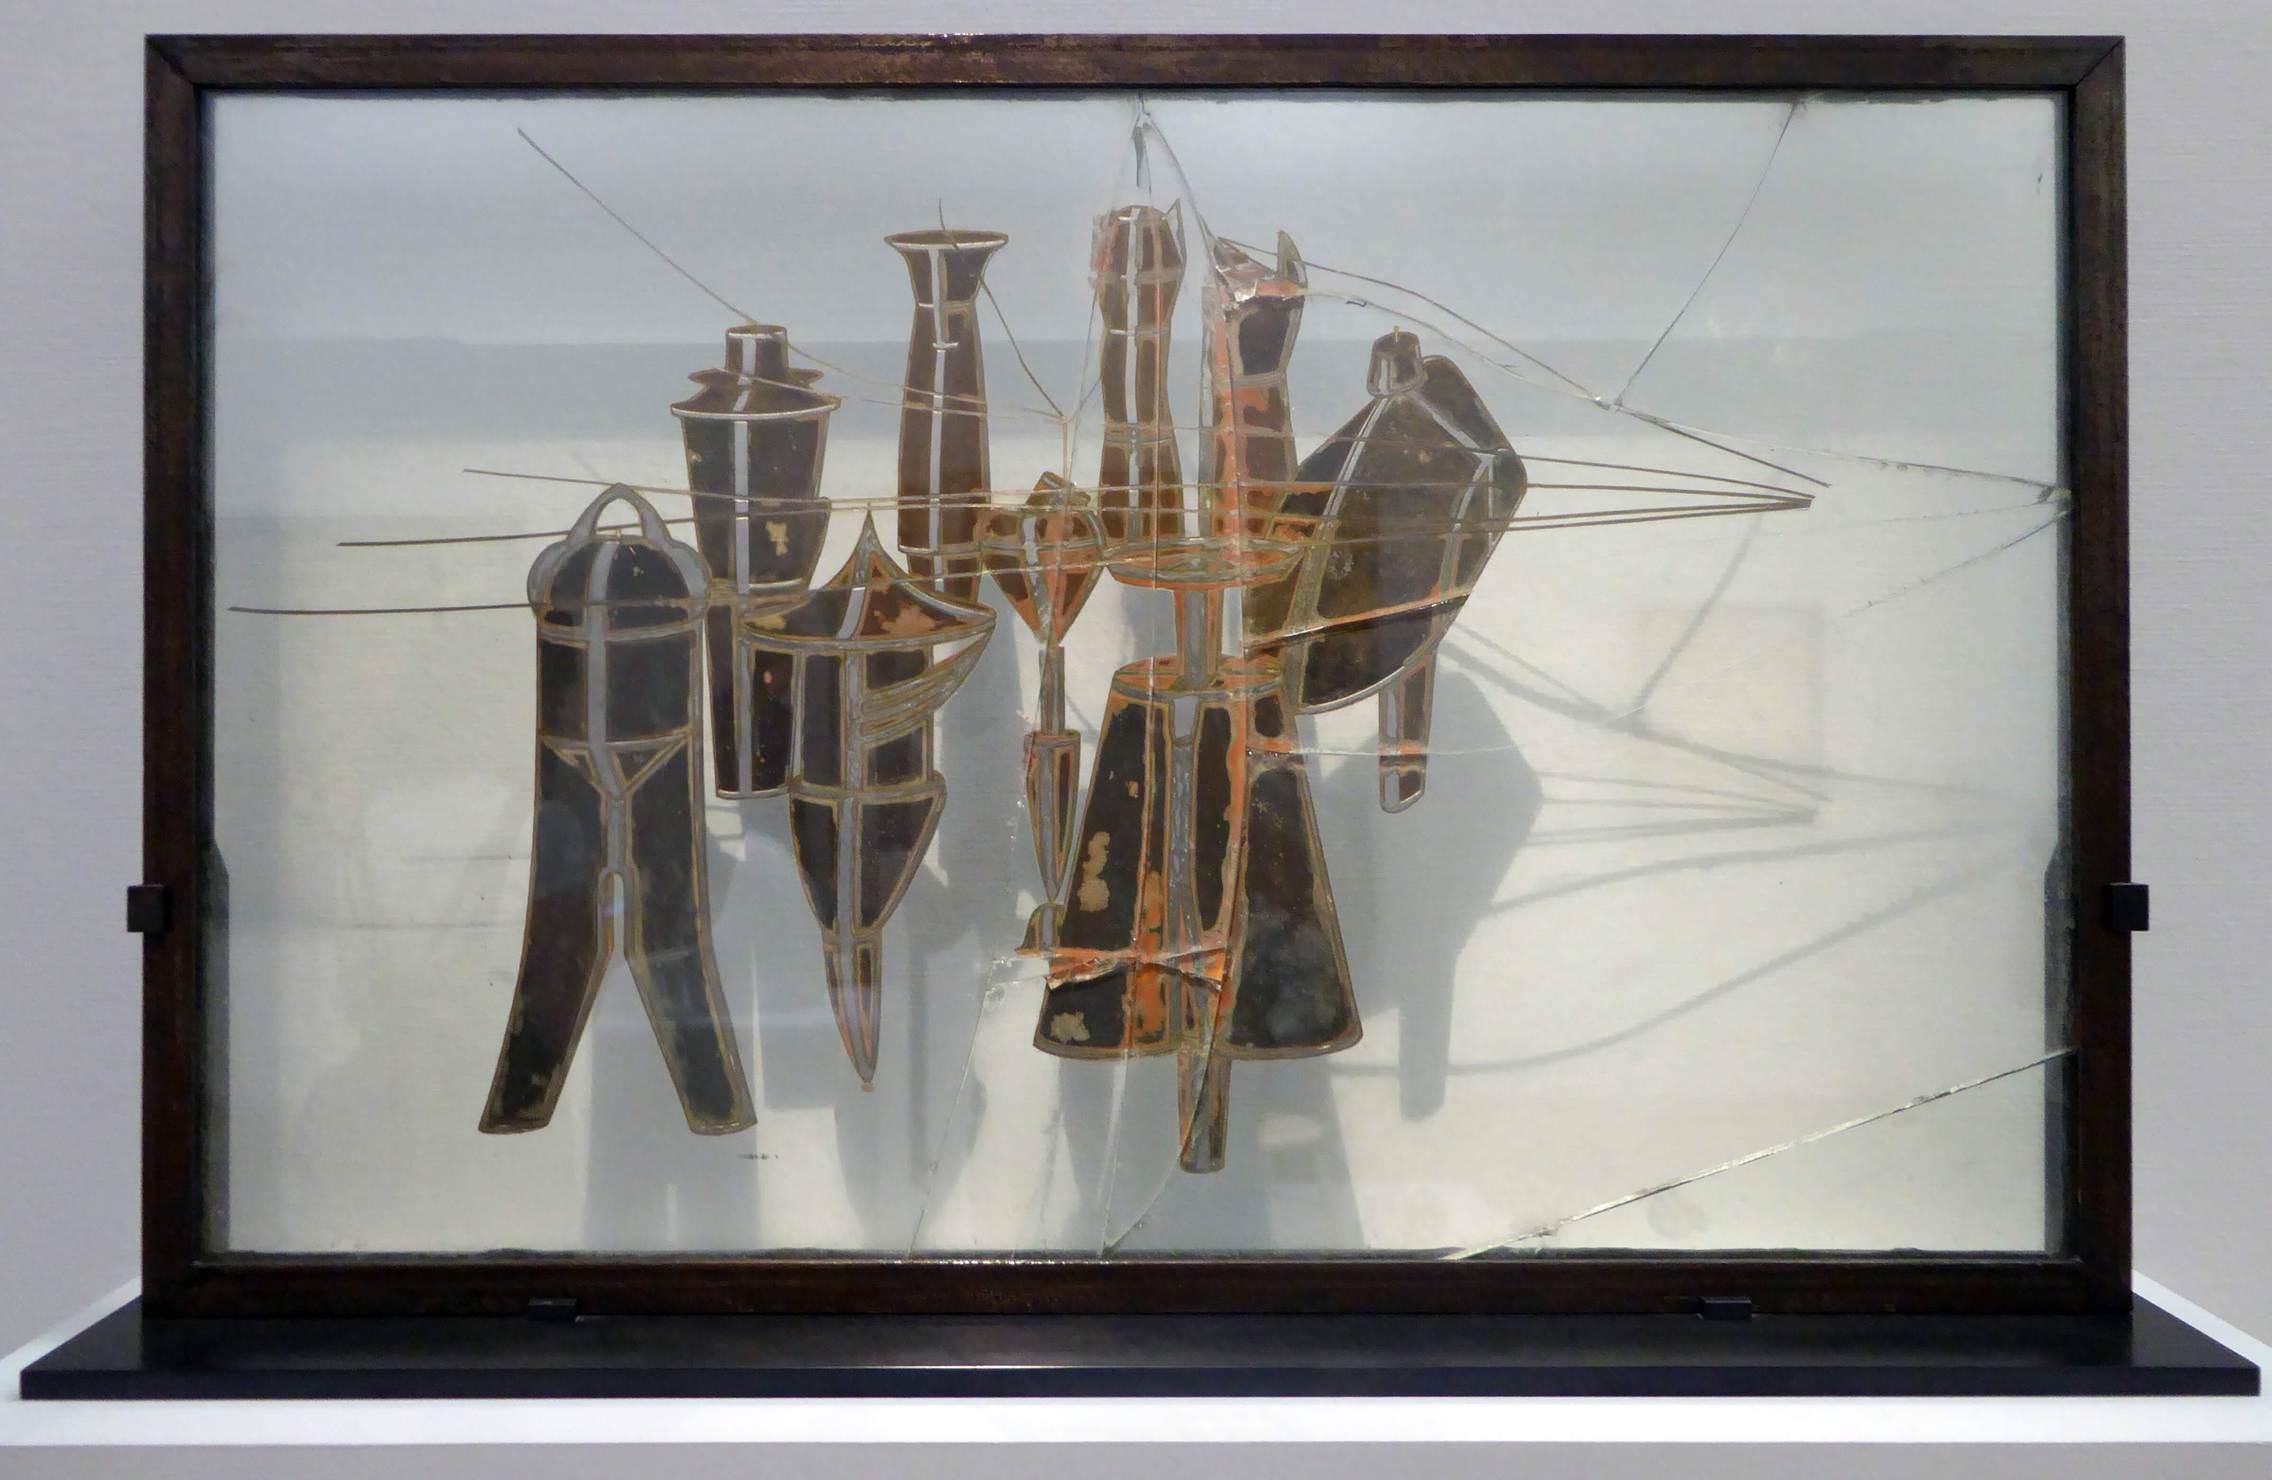 2272x1480 Marcel Duchamp - Chín Khuôn mẫu Malic.  Trung tâm Pompidu, Paris